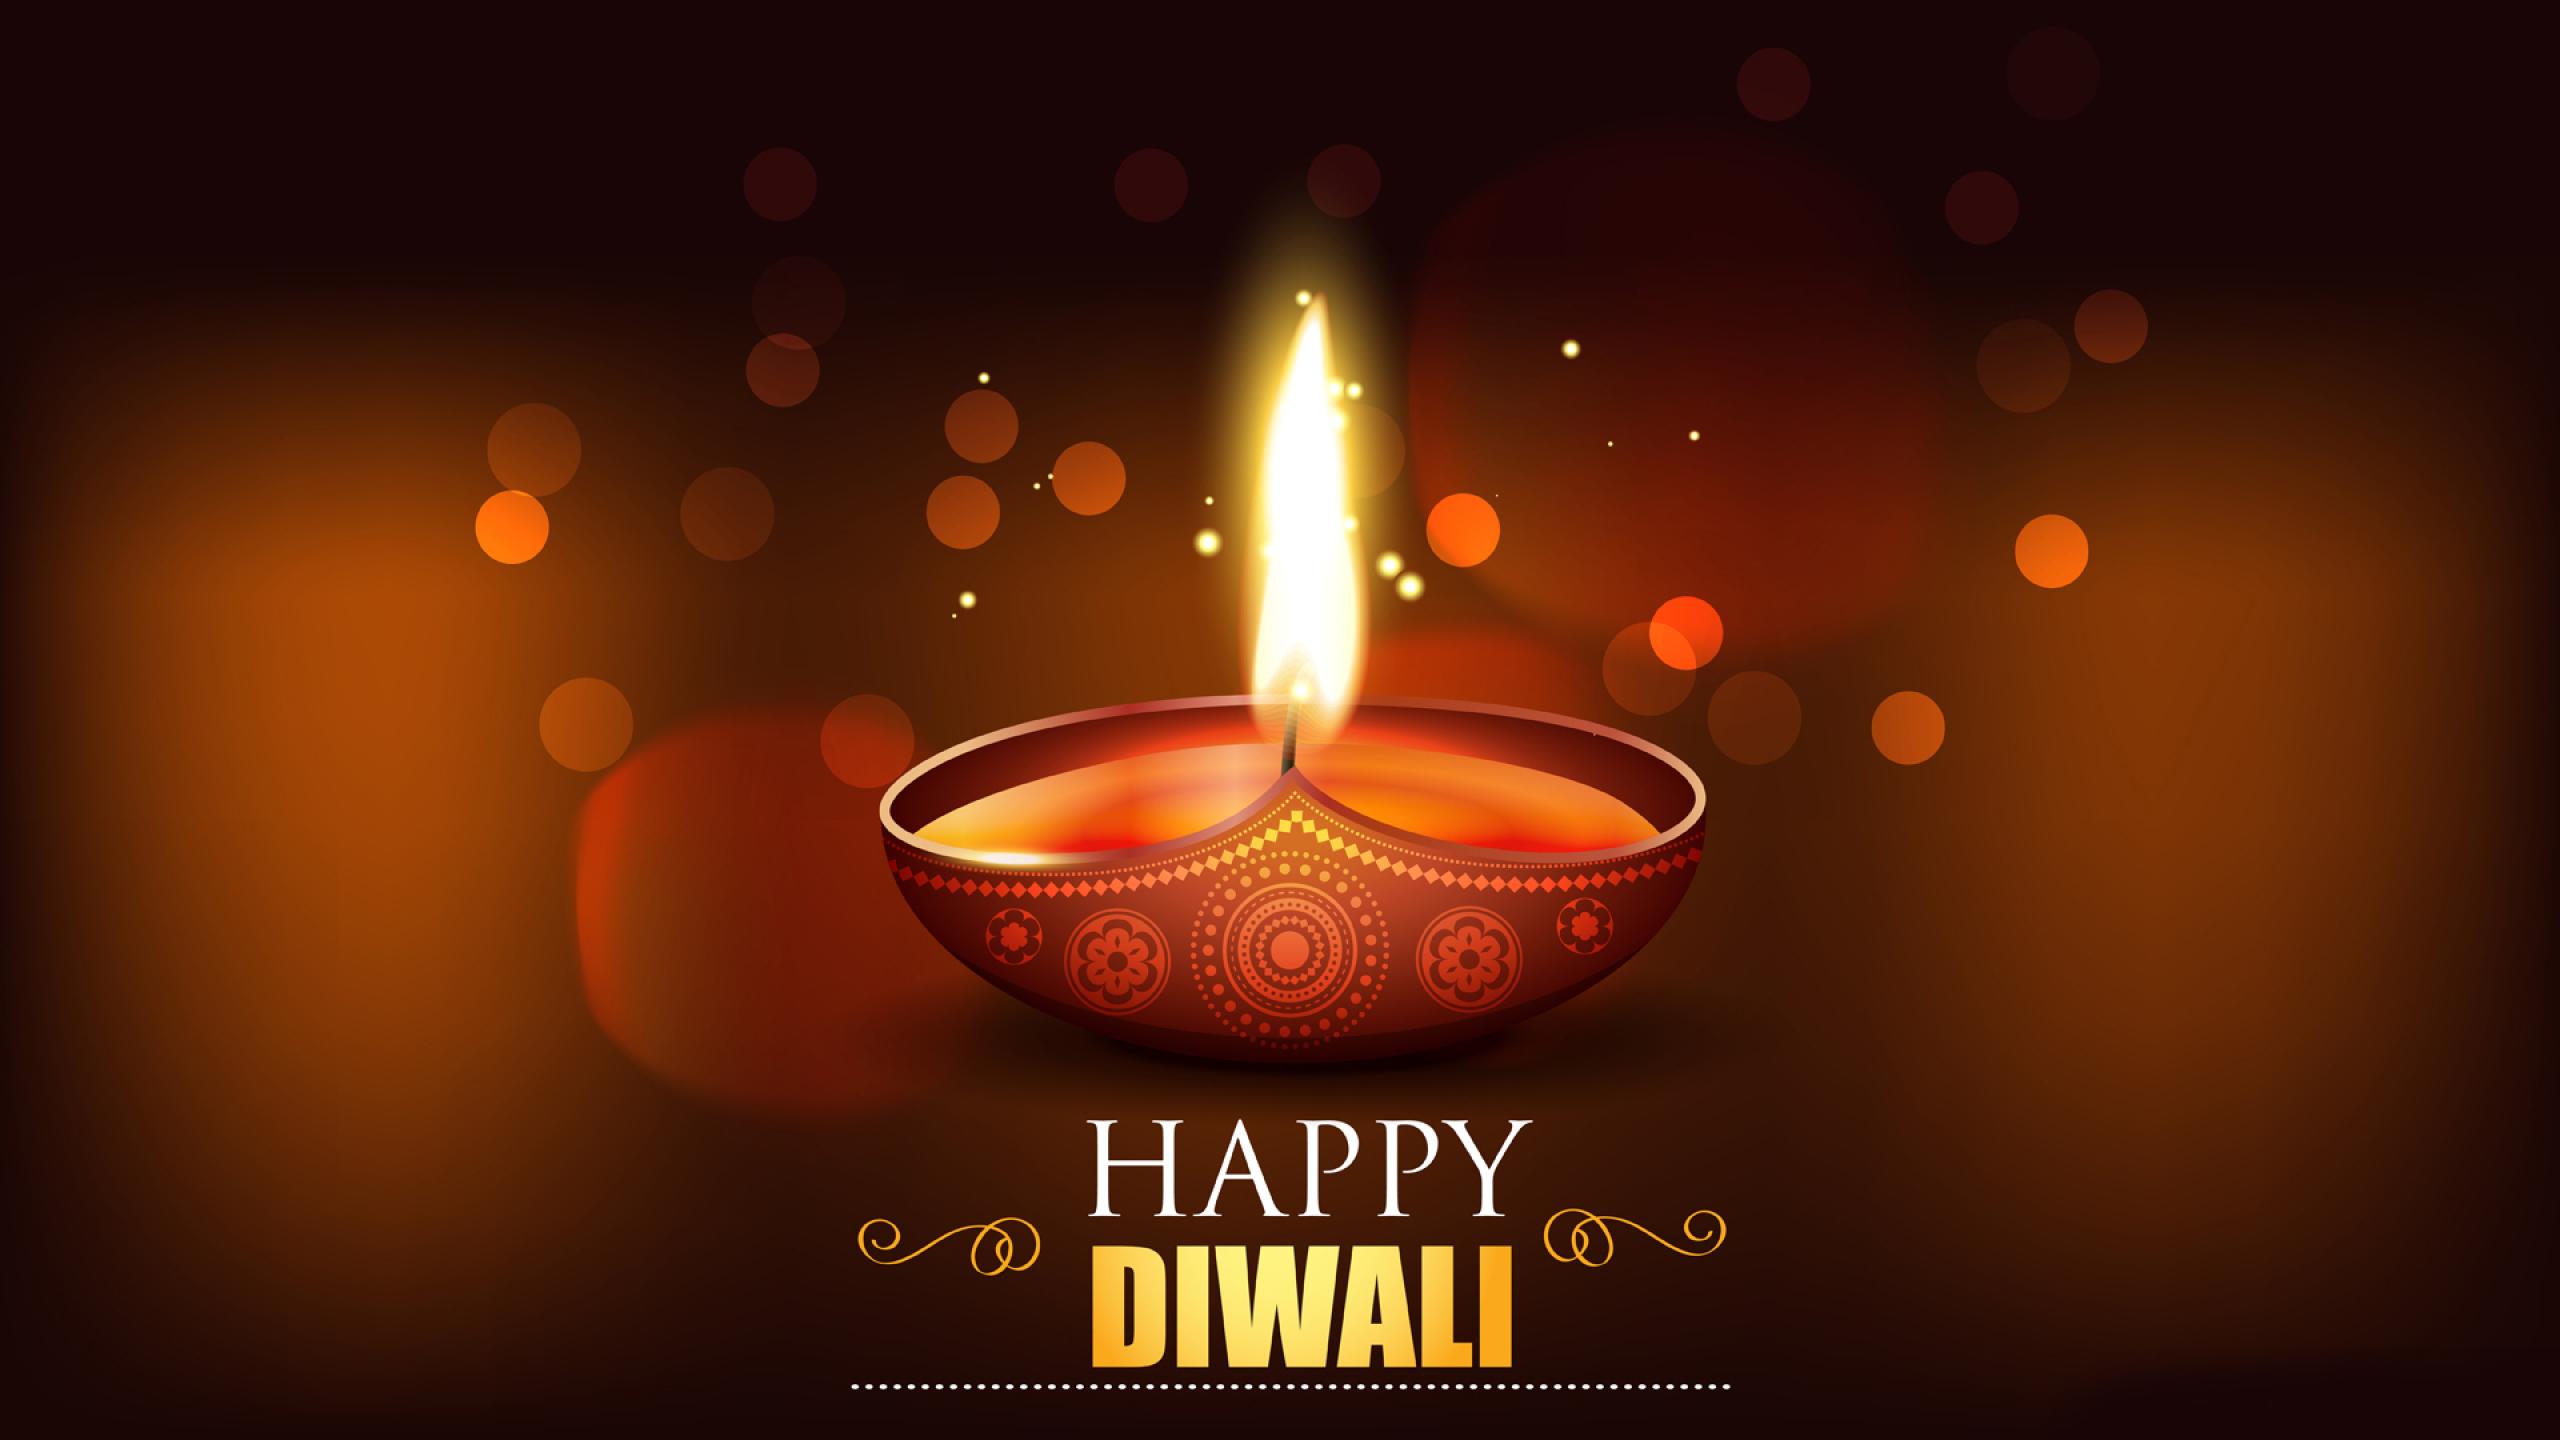 Happy Diwali 2020 Wallpaper in 2560x1440 Resolution